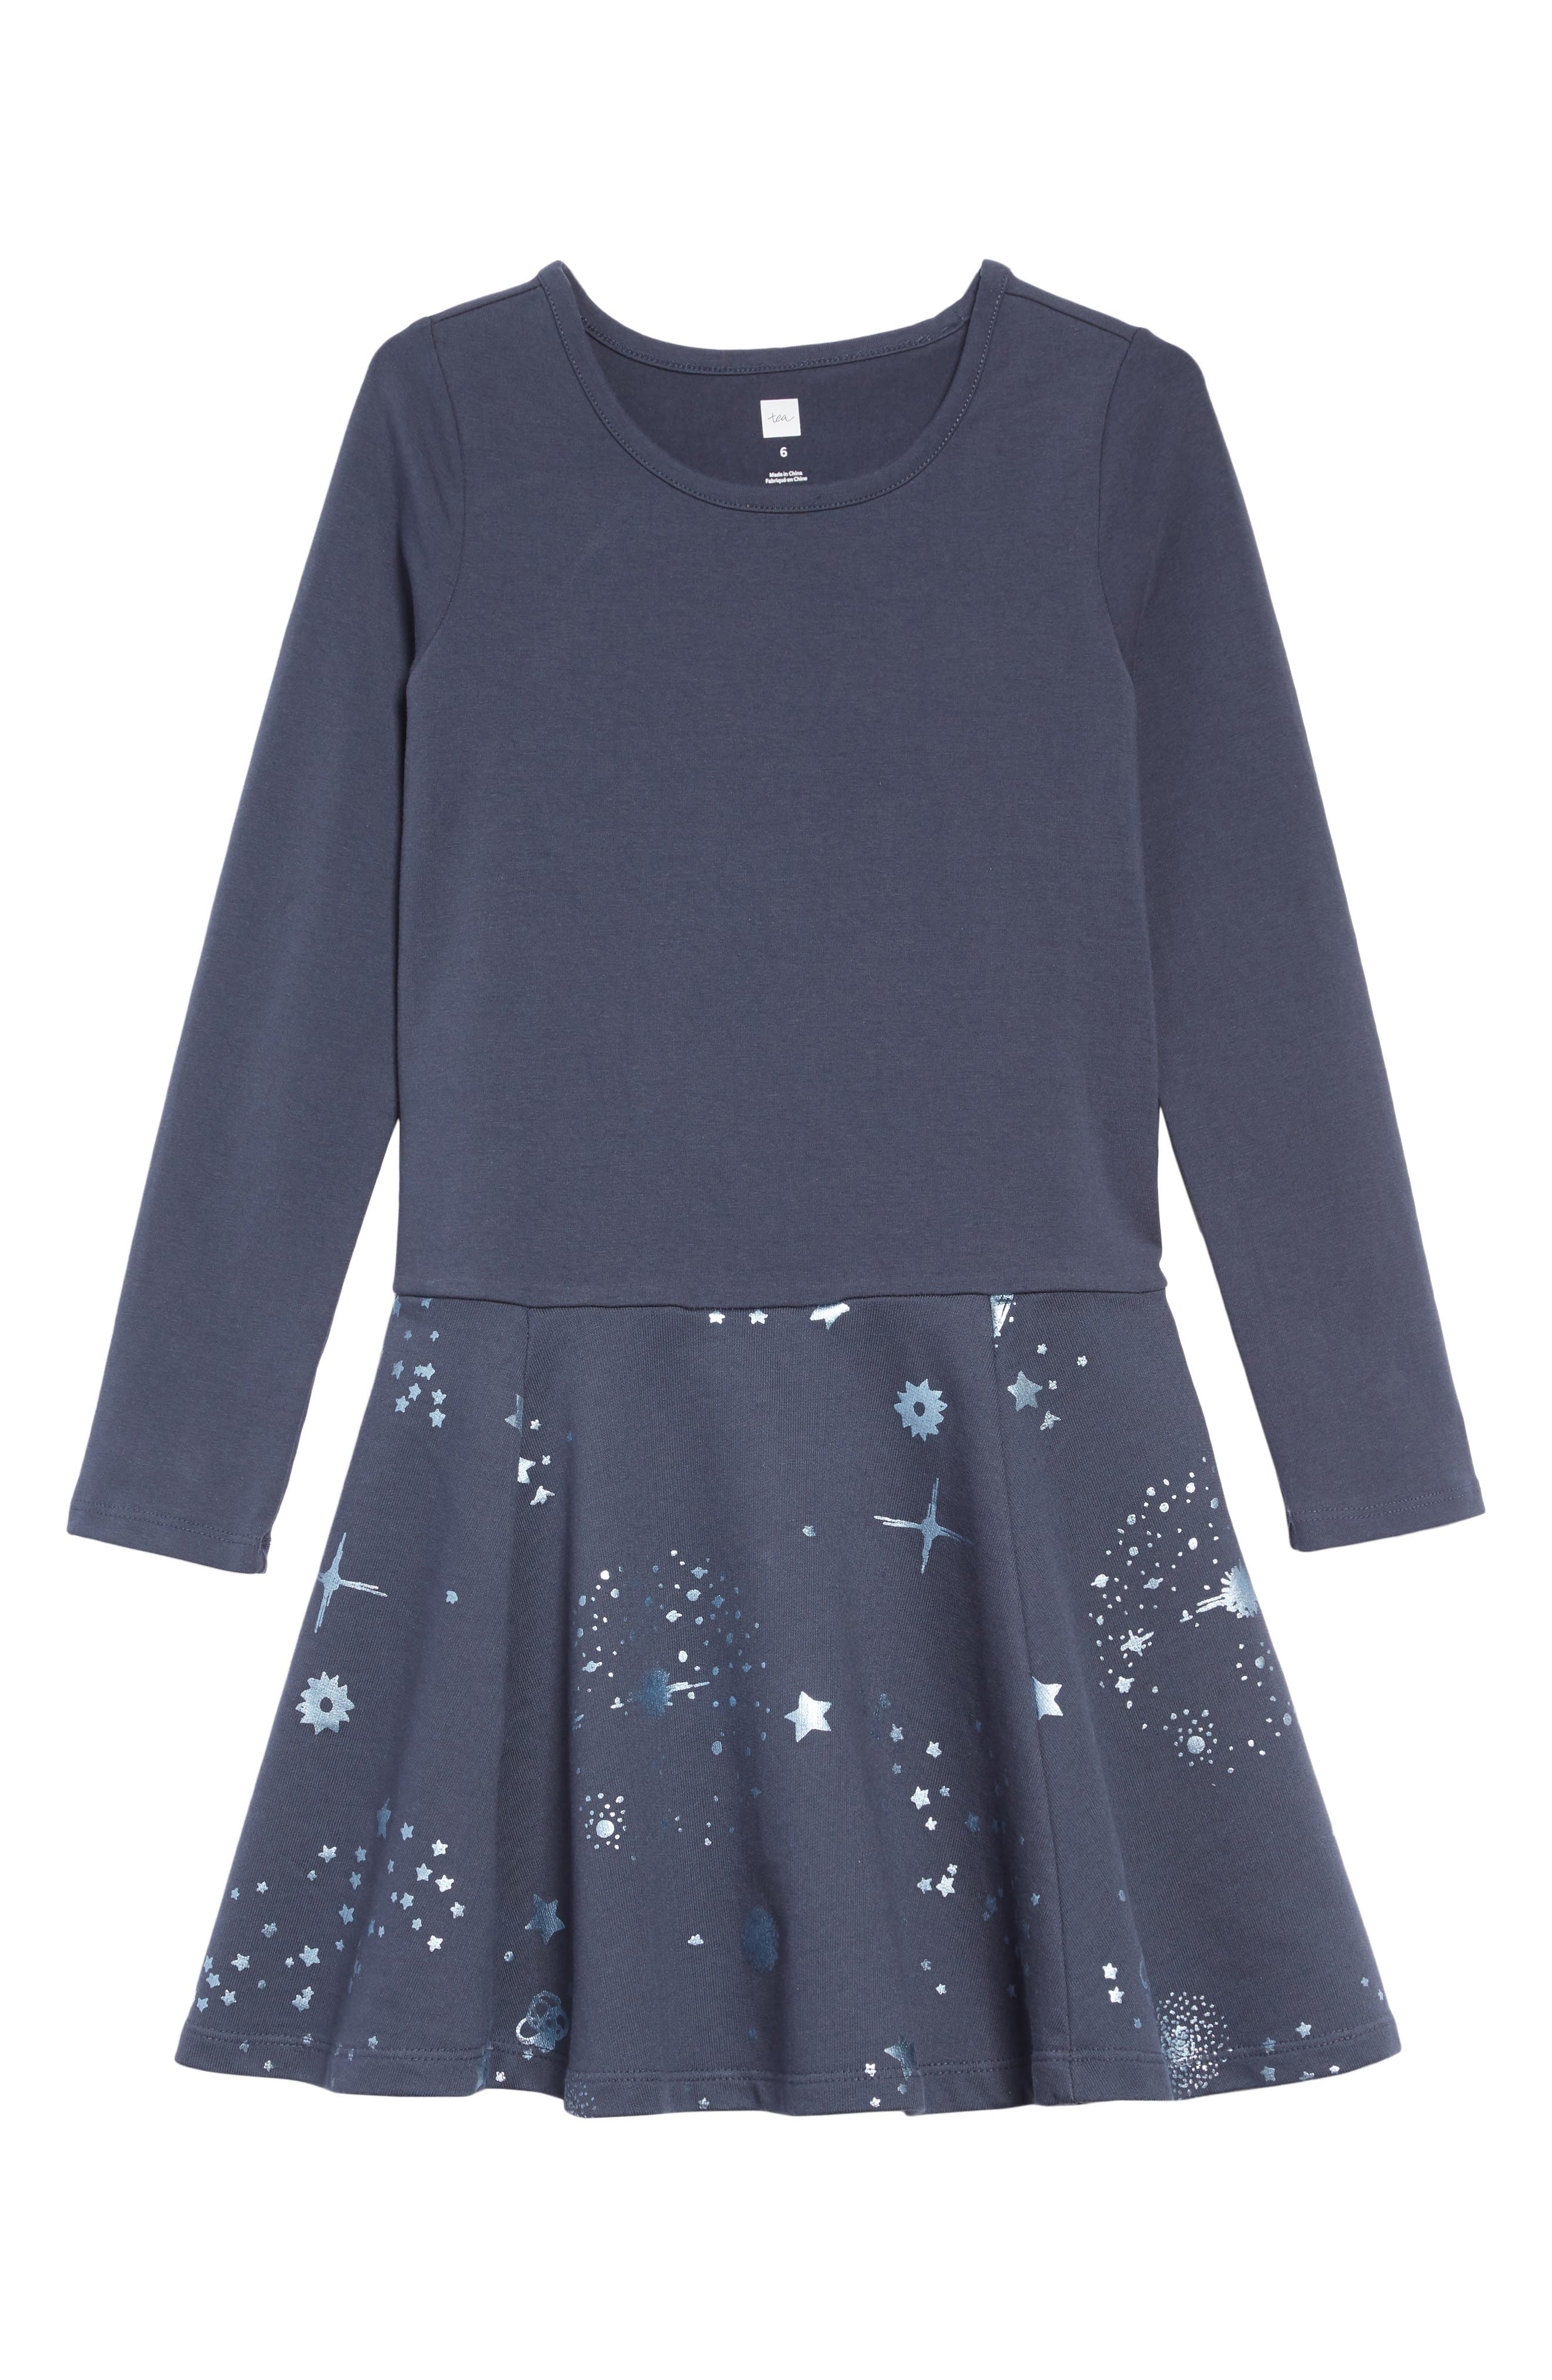 Starry Skies Dress,                             Main thumbnail 1, color,                             STARRY SKIES - INDIGO